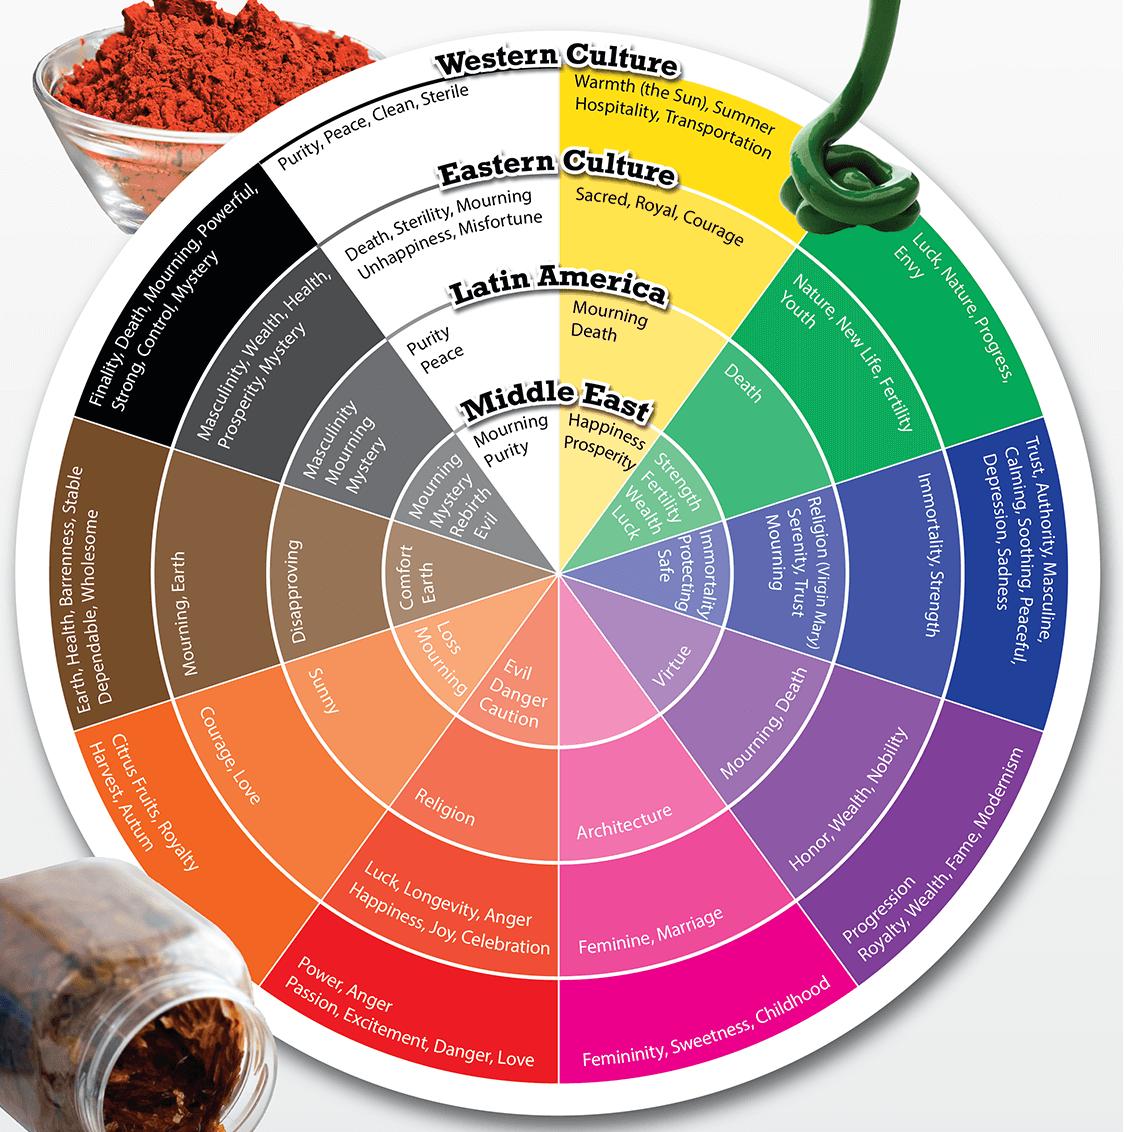 Цветовые Тренды в Веб Дизайне 2020 культуры